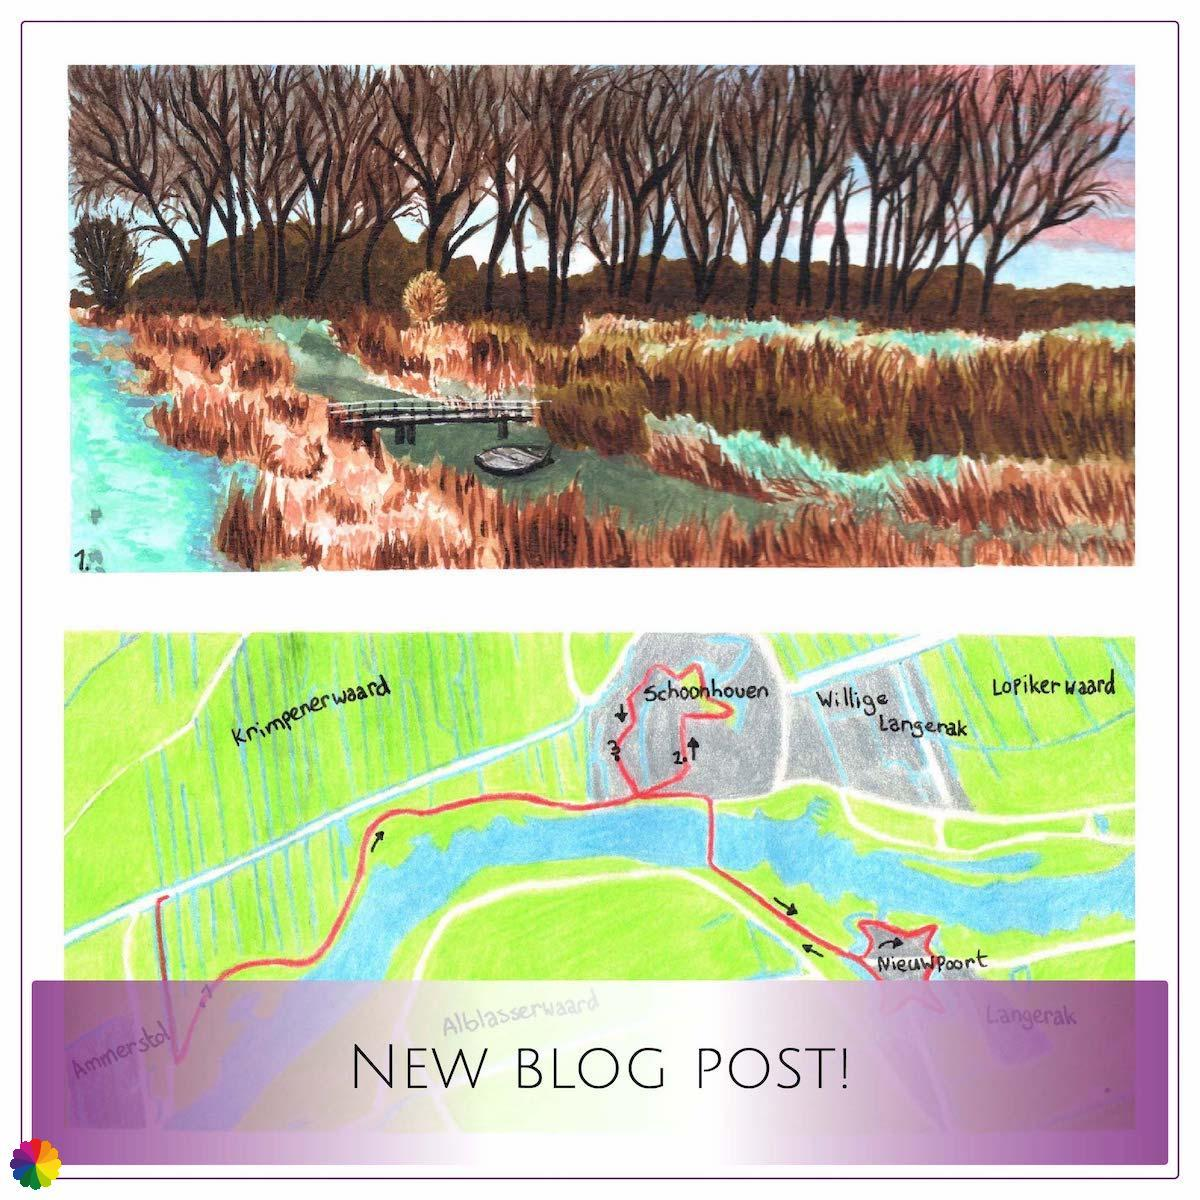 Blog update Great rivers trail Ammerstol - Nieuwpoort